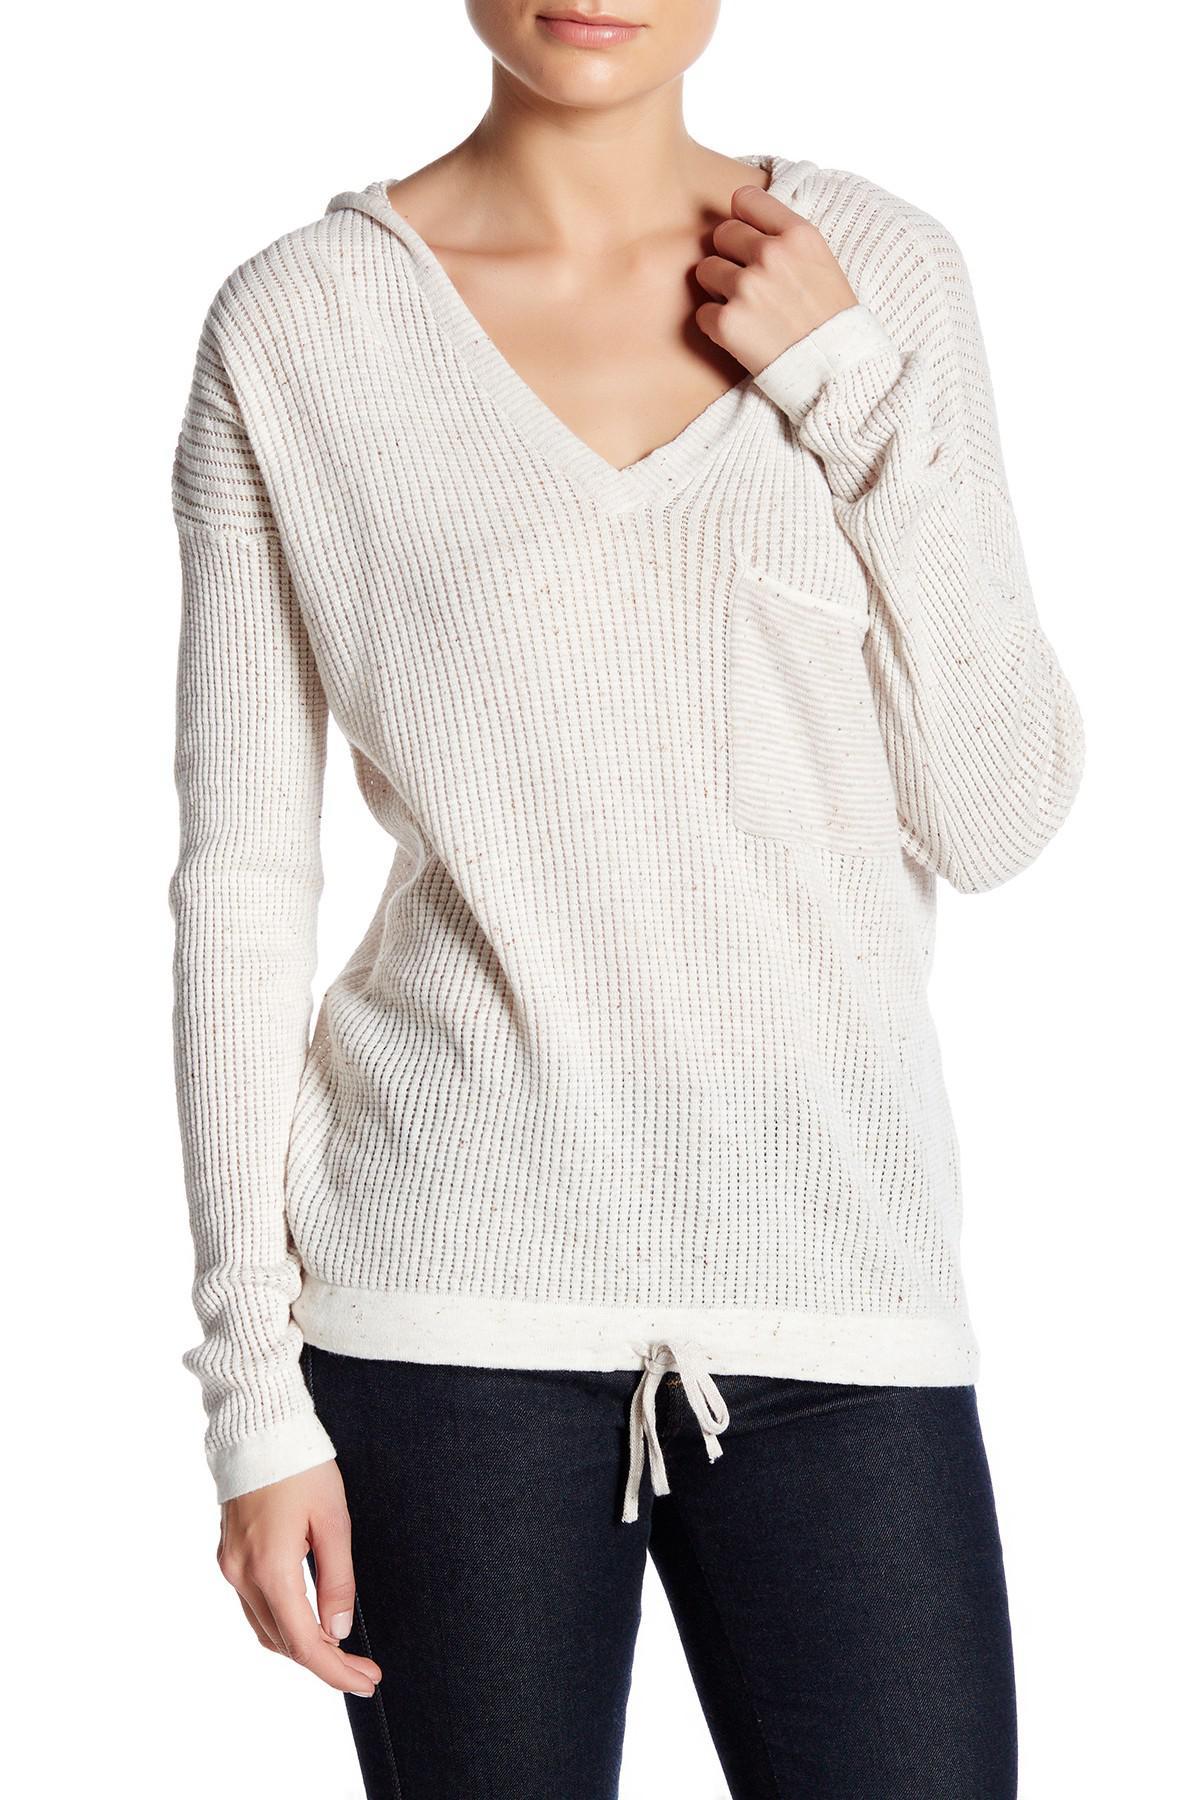 Lyst - Democracy V-neck Knit Hooded Sweater in White 08cb03c53